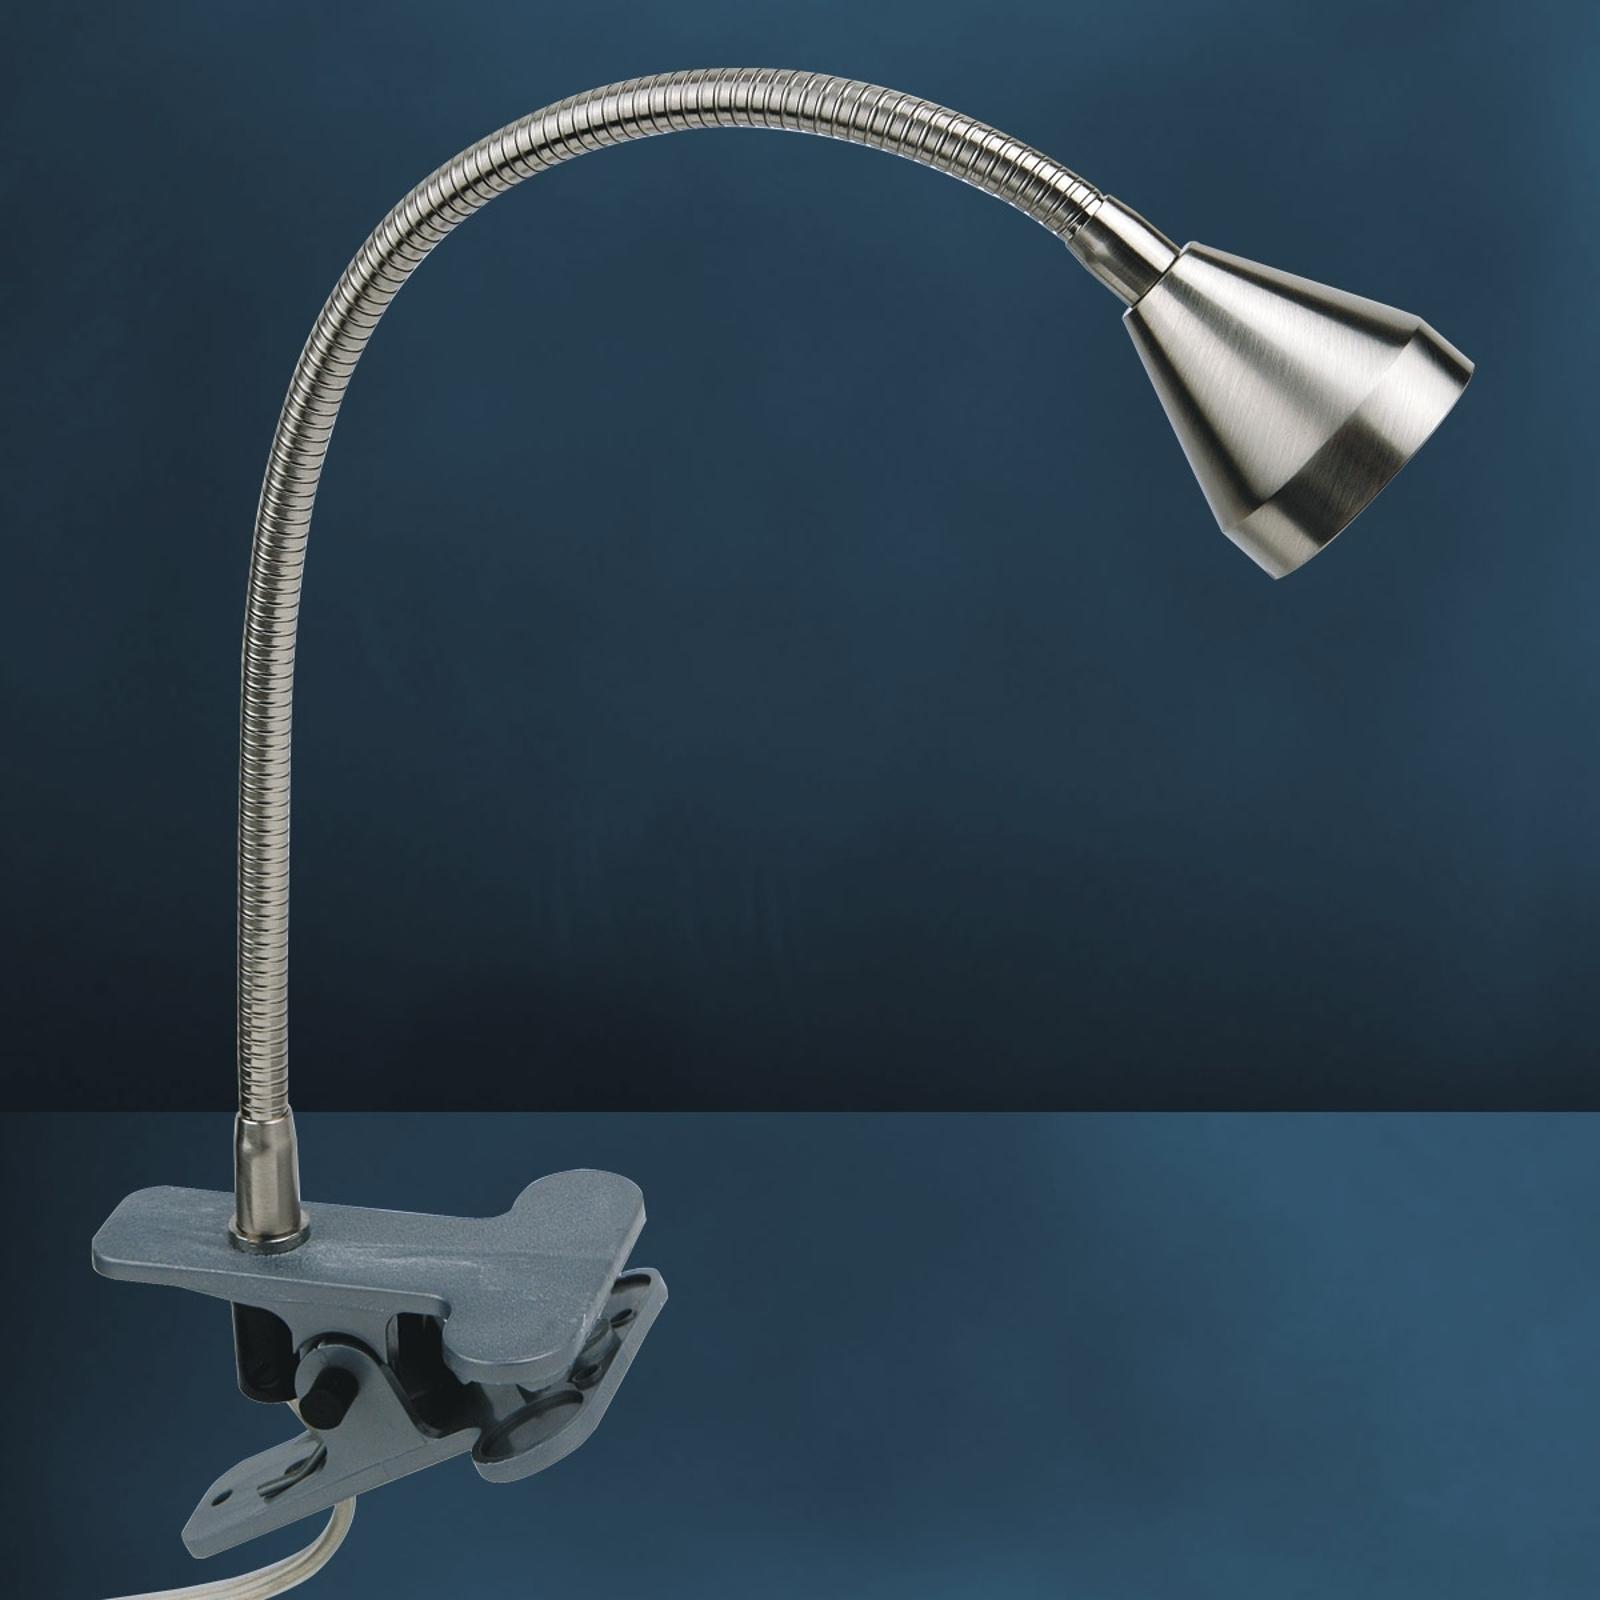 Lampa zaciskowa LED MINI uniwersalna biel